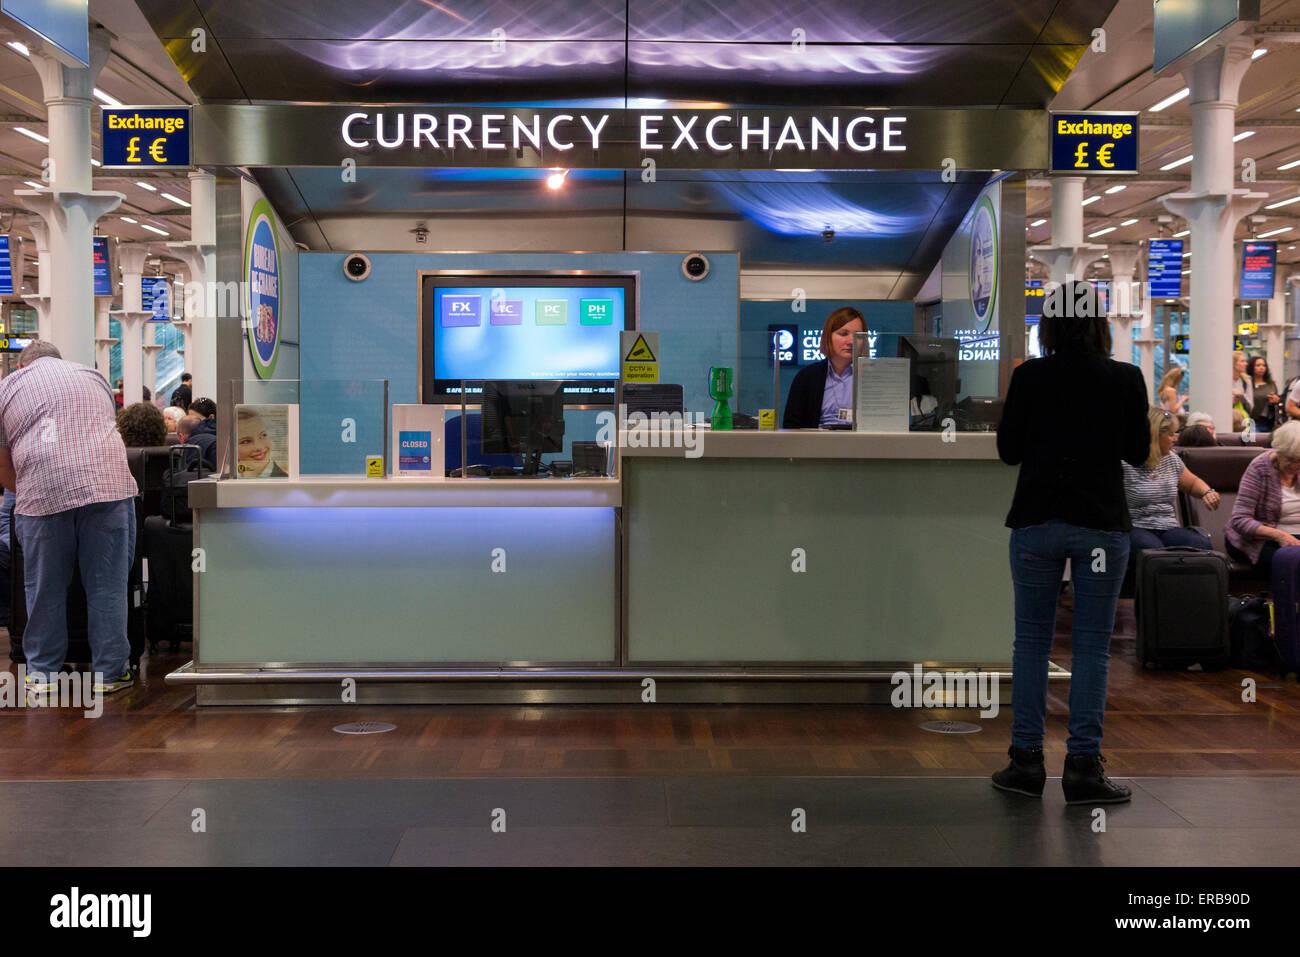 Exchange bureau de change where is the best place to change money